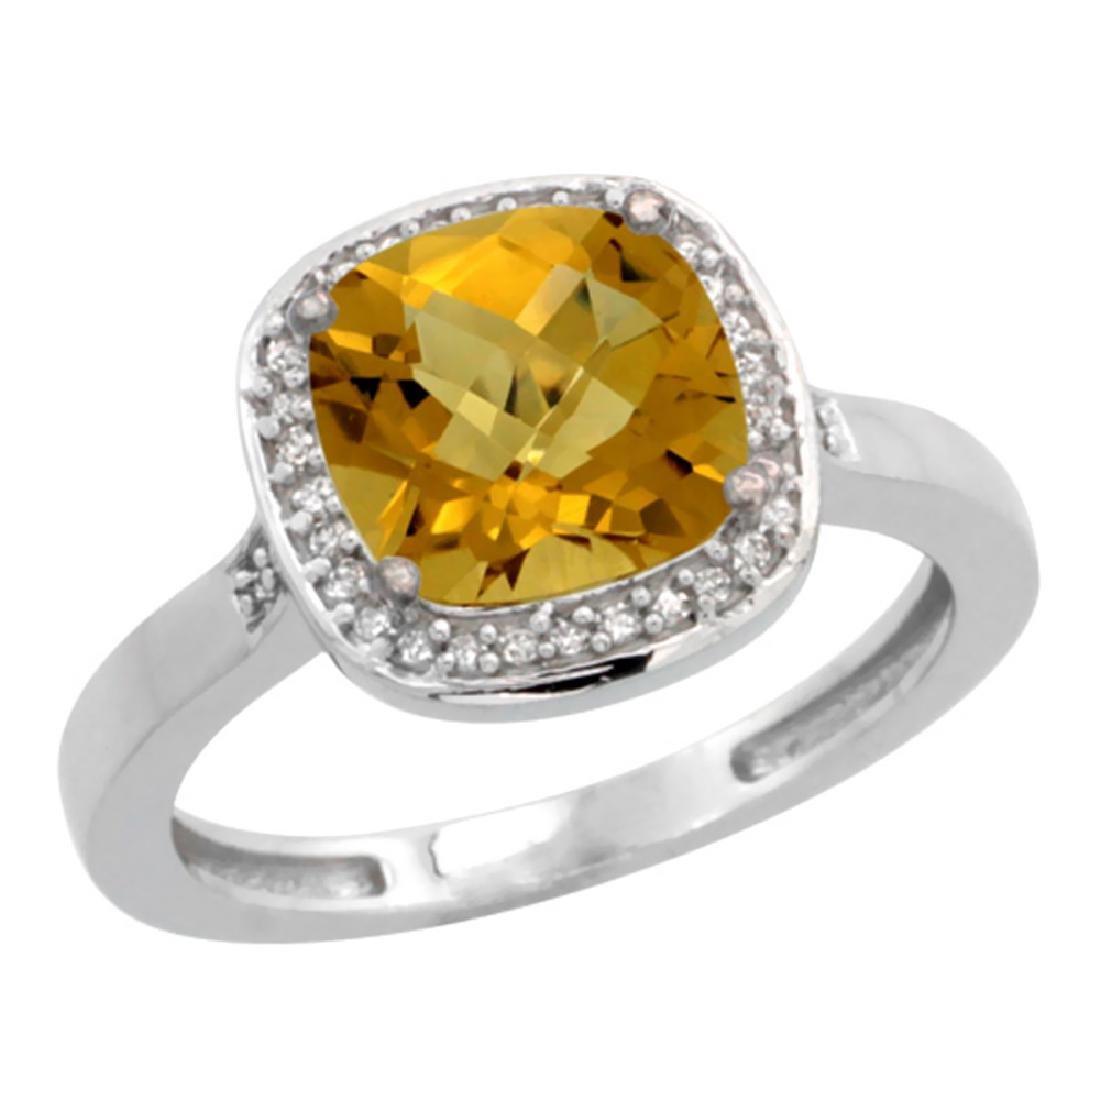 Natural 3.94 ctw Whisky-quartz & Diamond Engagement